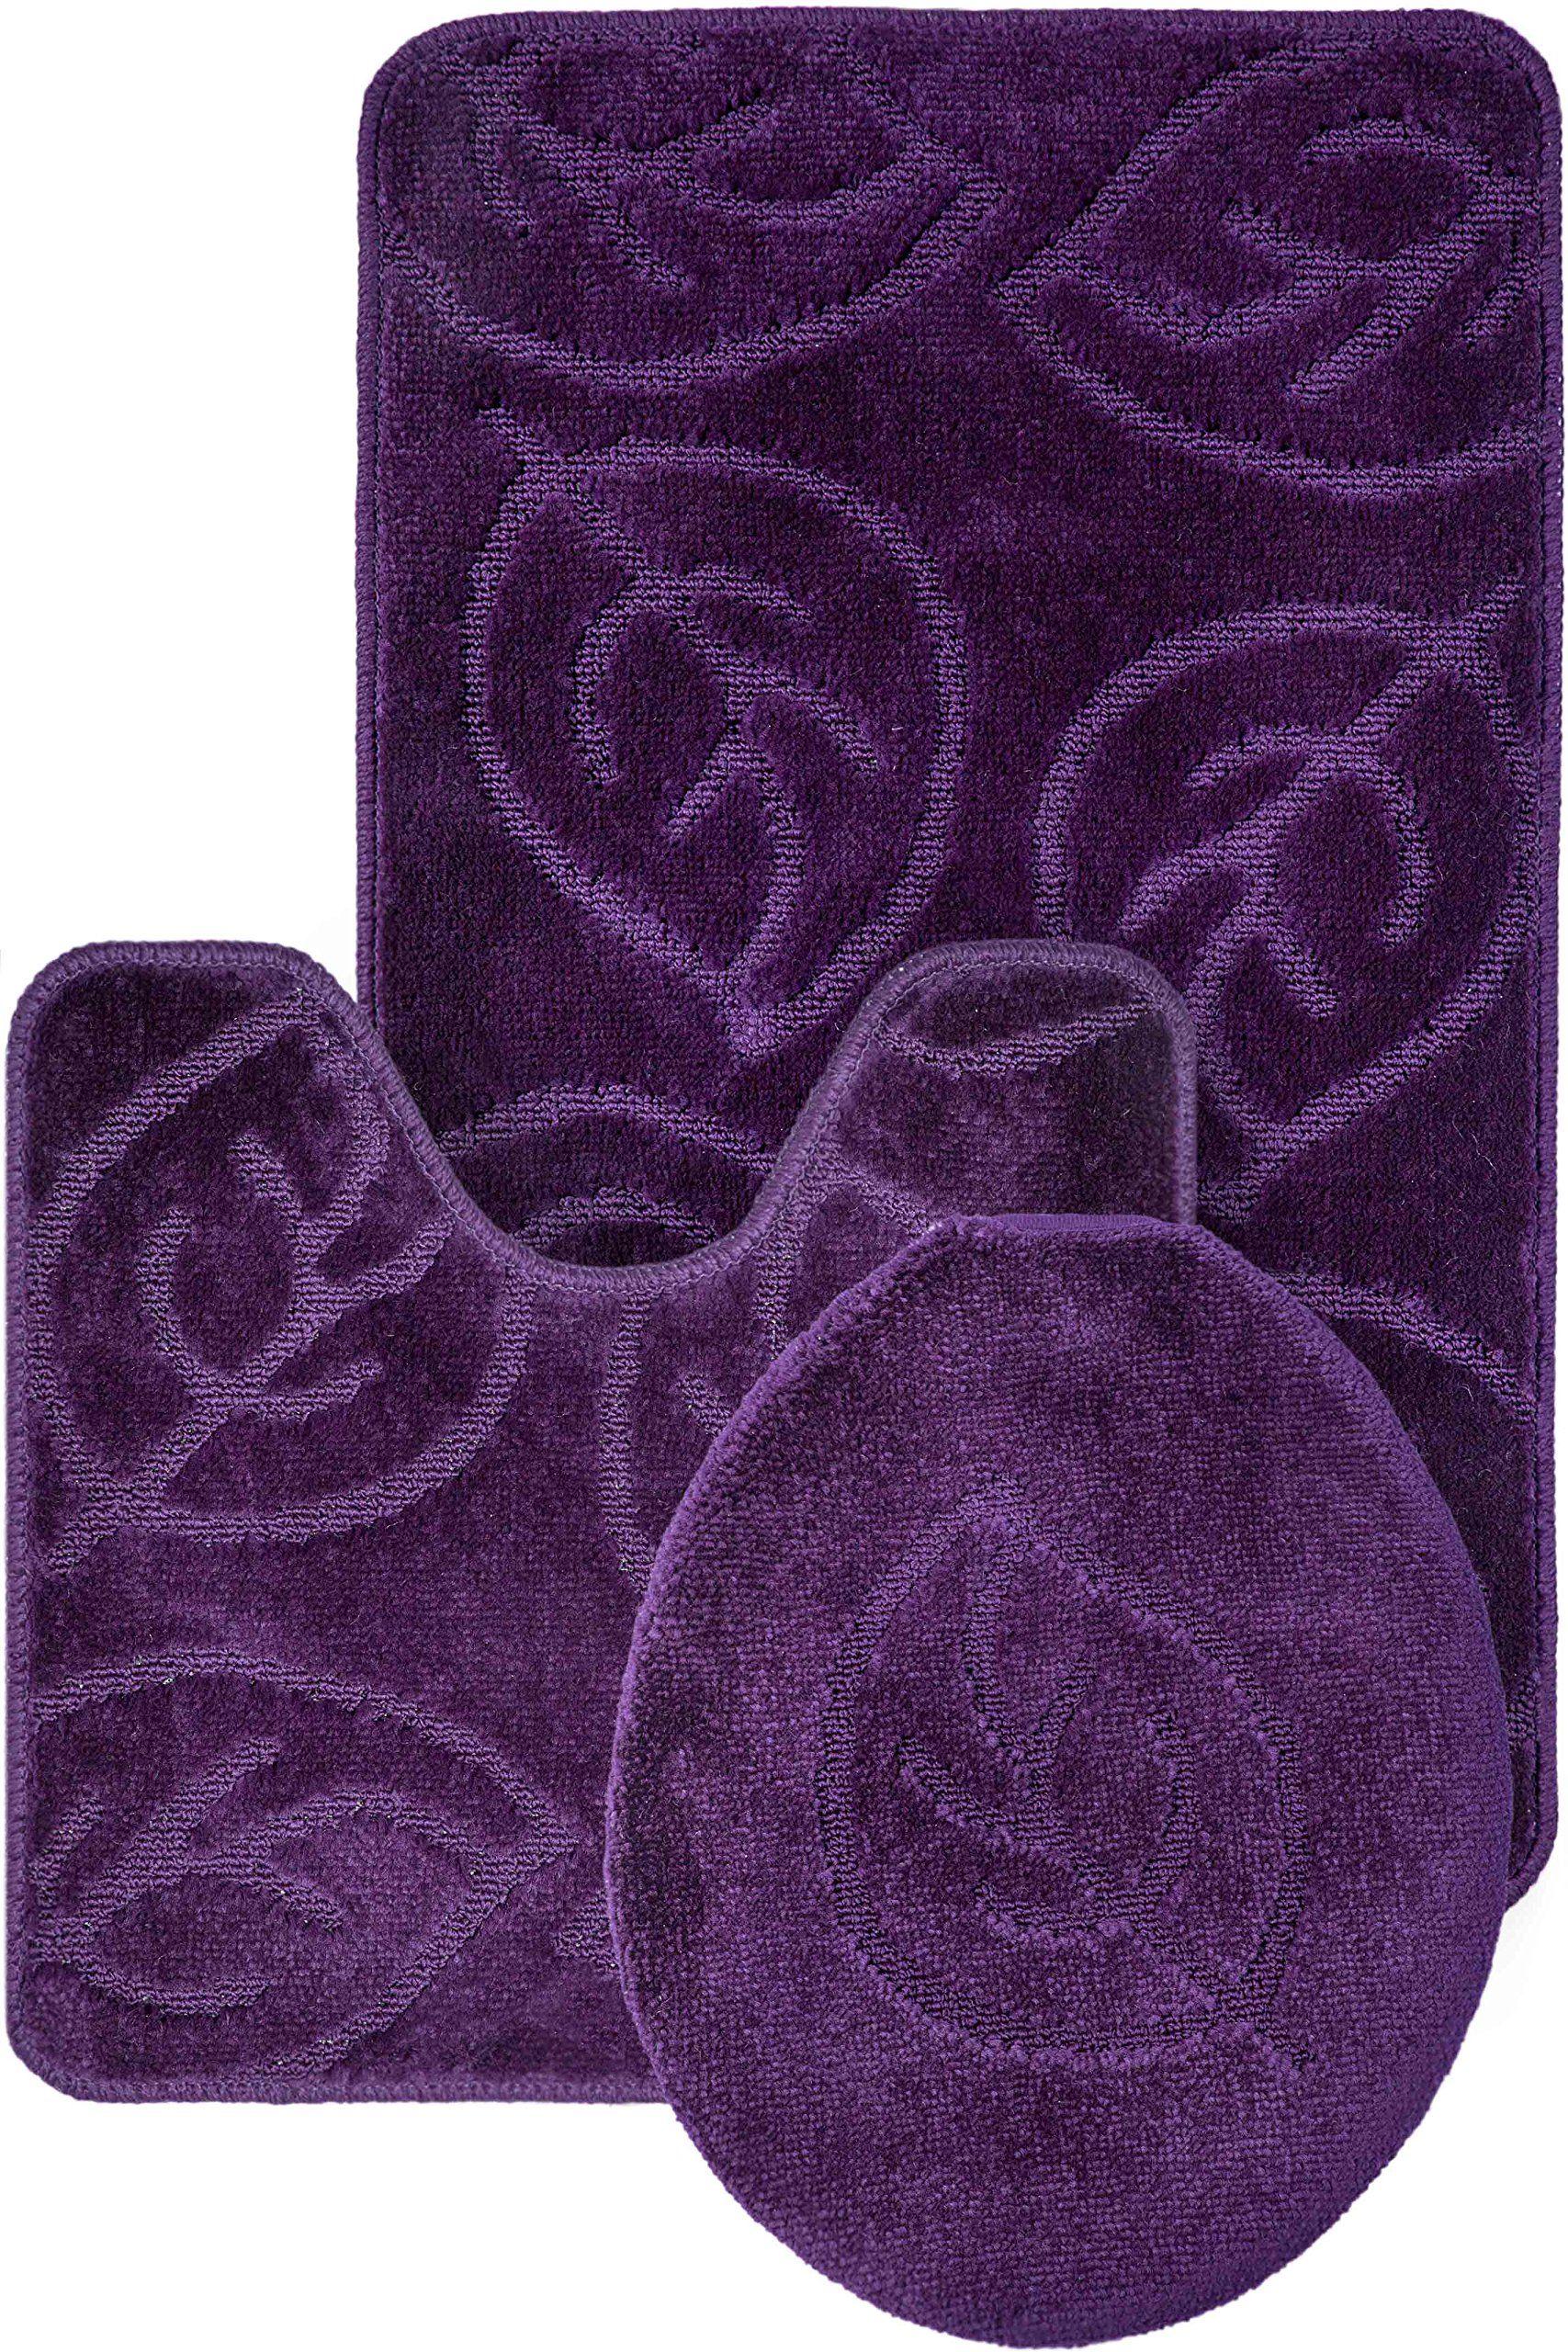 Everdayspecial Purple Bath Set Leaf Pattern Bathroom Rug 18x29 Contour Mat 18x19 Lid Cover 18x18 Soft An Patterned Bathroom Rugs Bathroom Rugs Purple Bathrooms [ 2560 x 1707 Pixel ]